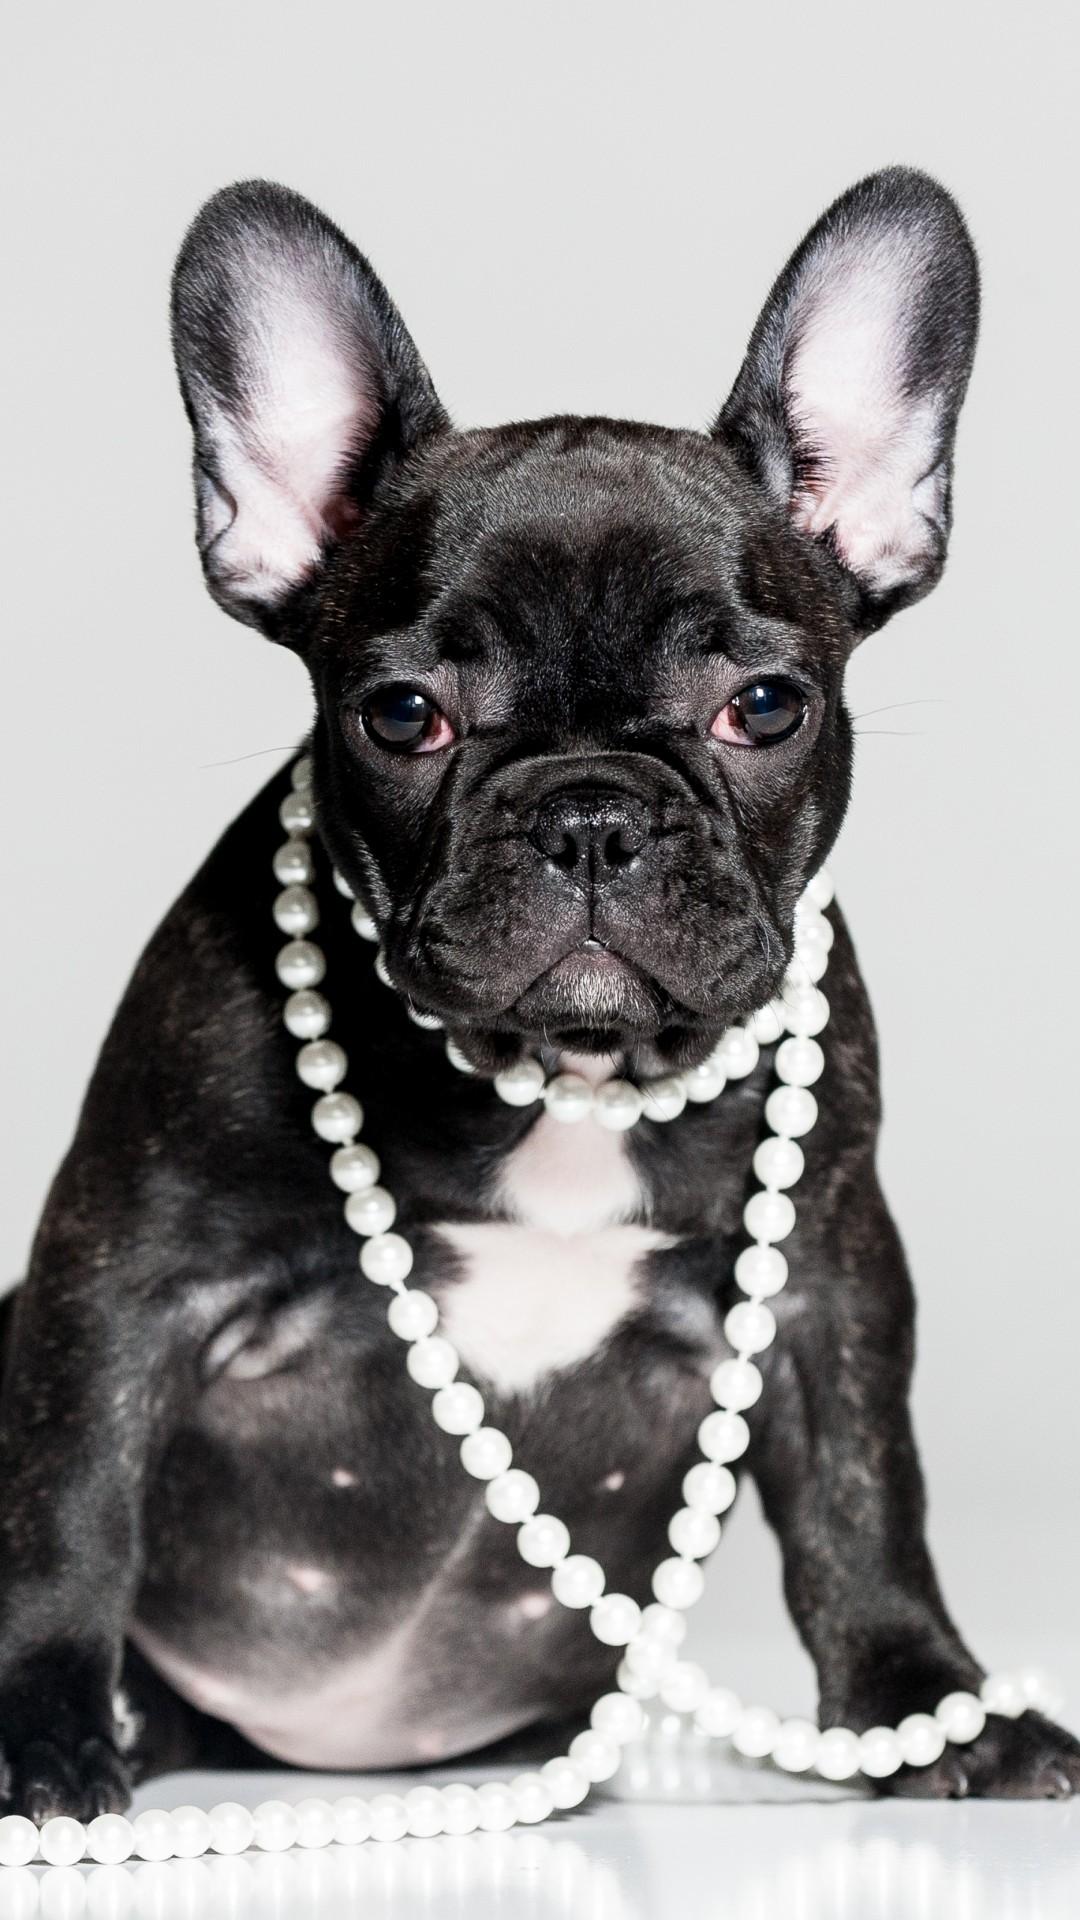 Blue Puppy Food >> Wallpaper French Bulldog, puppy, cute animals, 5k, Animals #16219